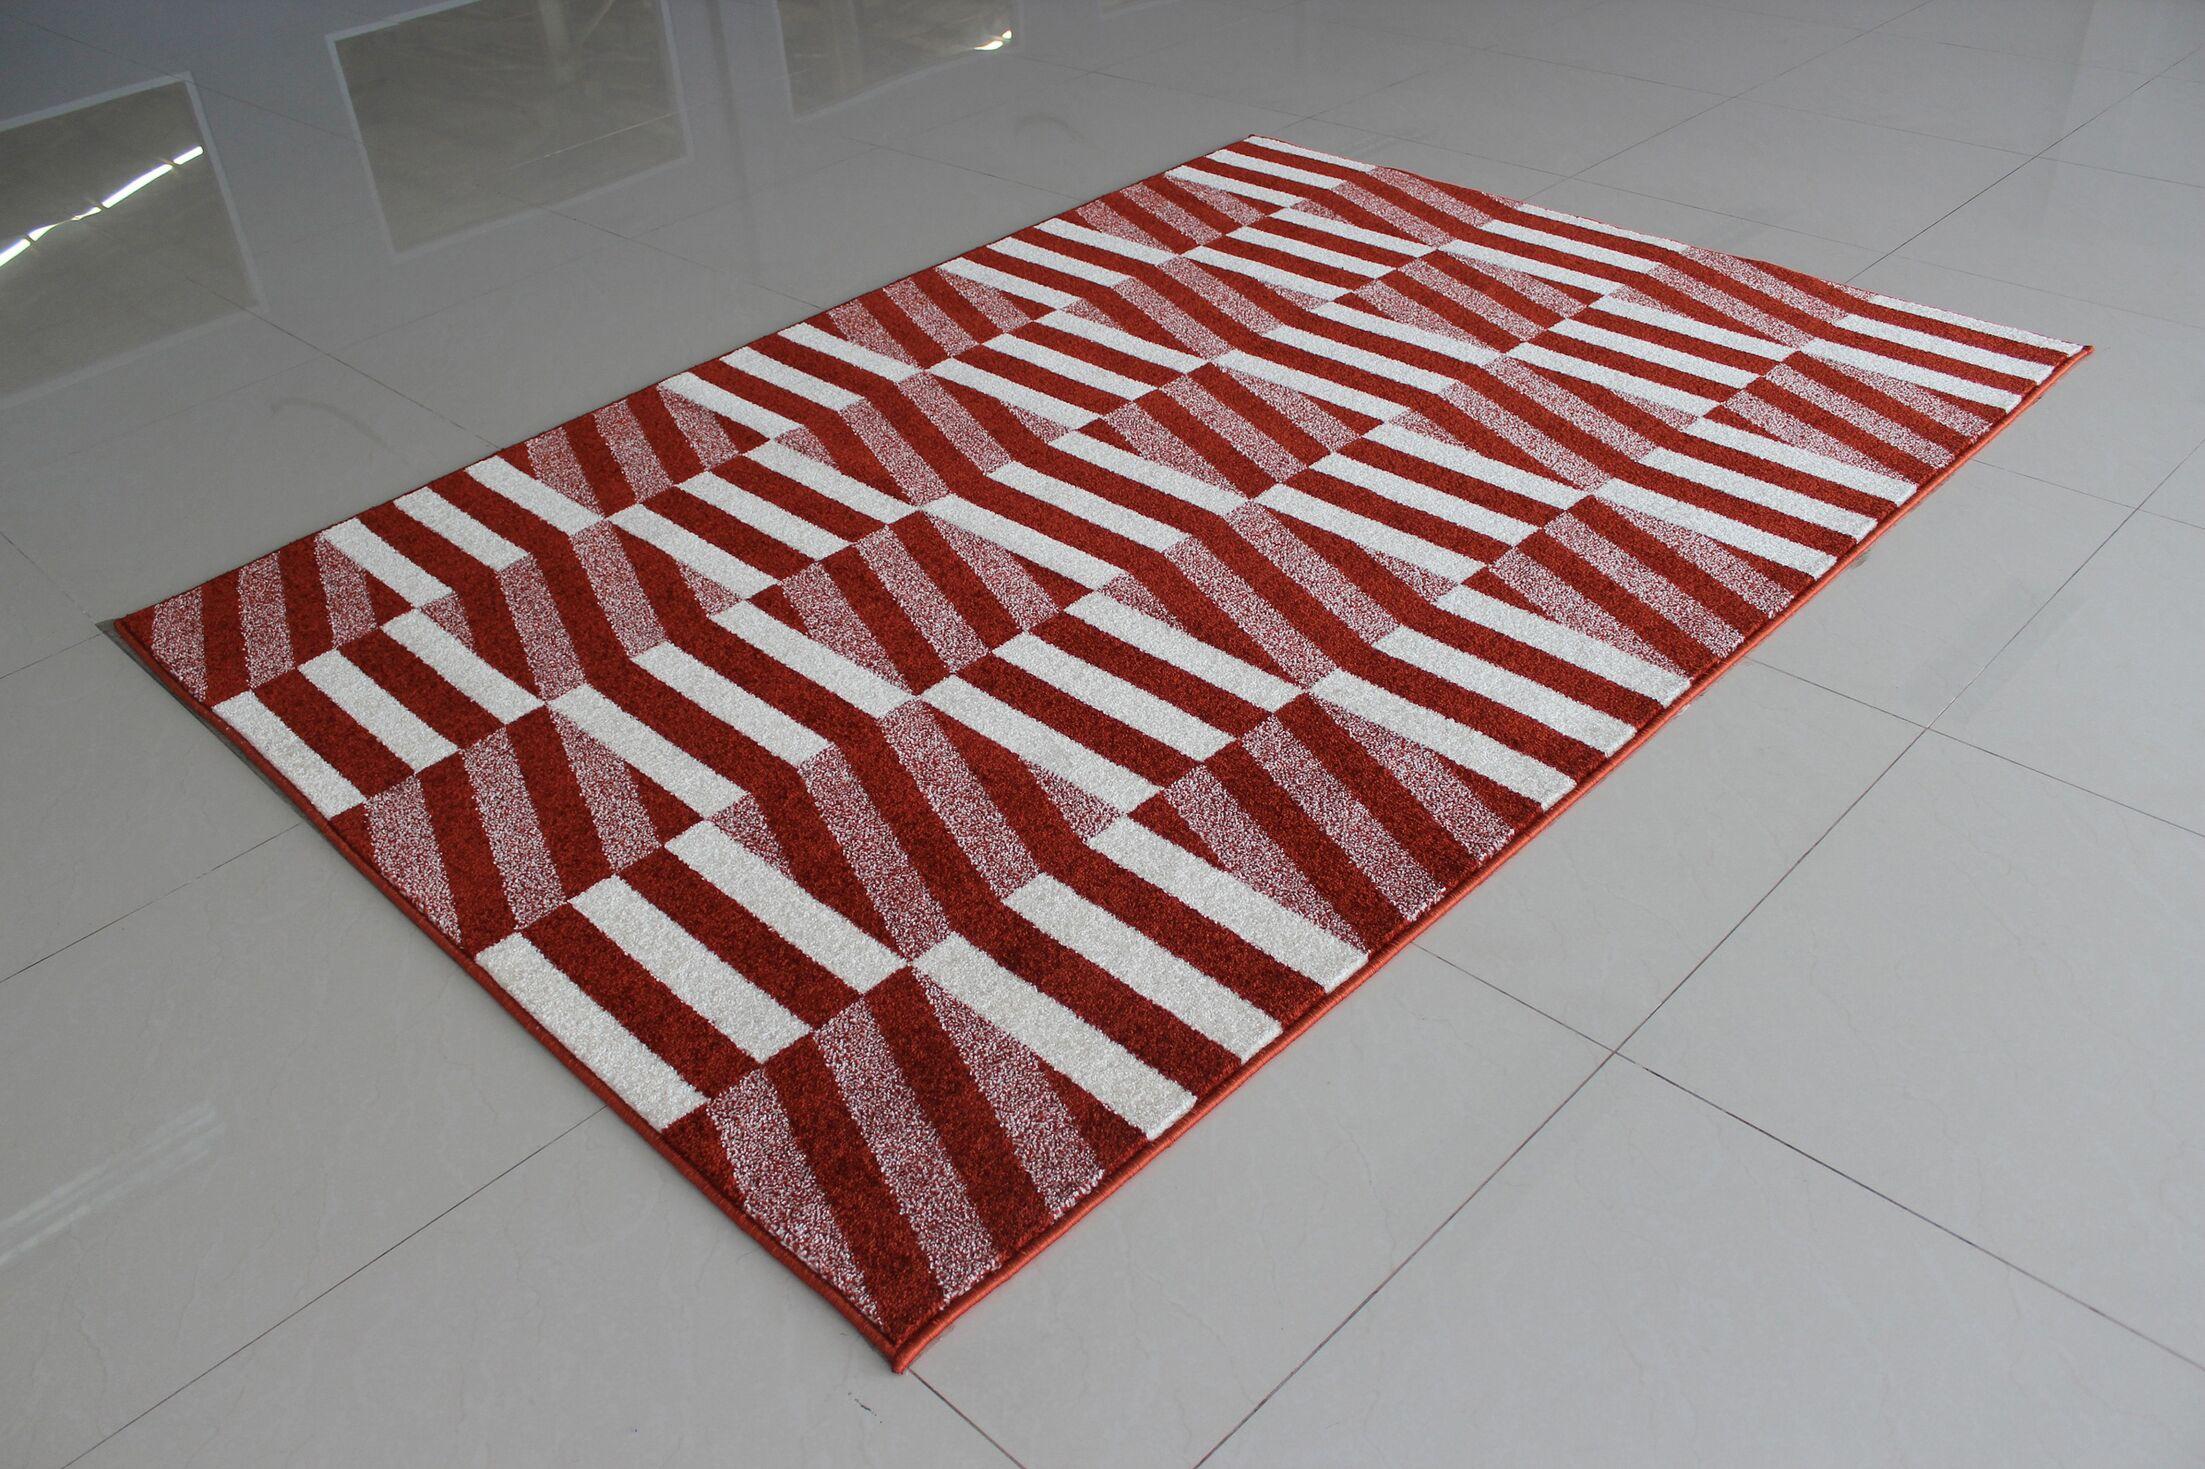 Mccollough Terracotta Area Rug Rug Size: 4' x 6'